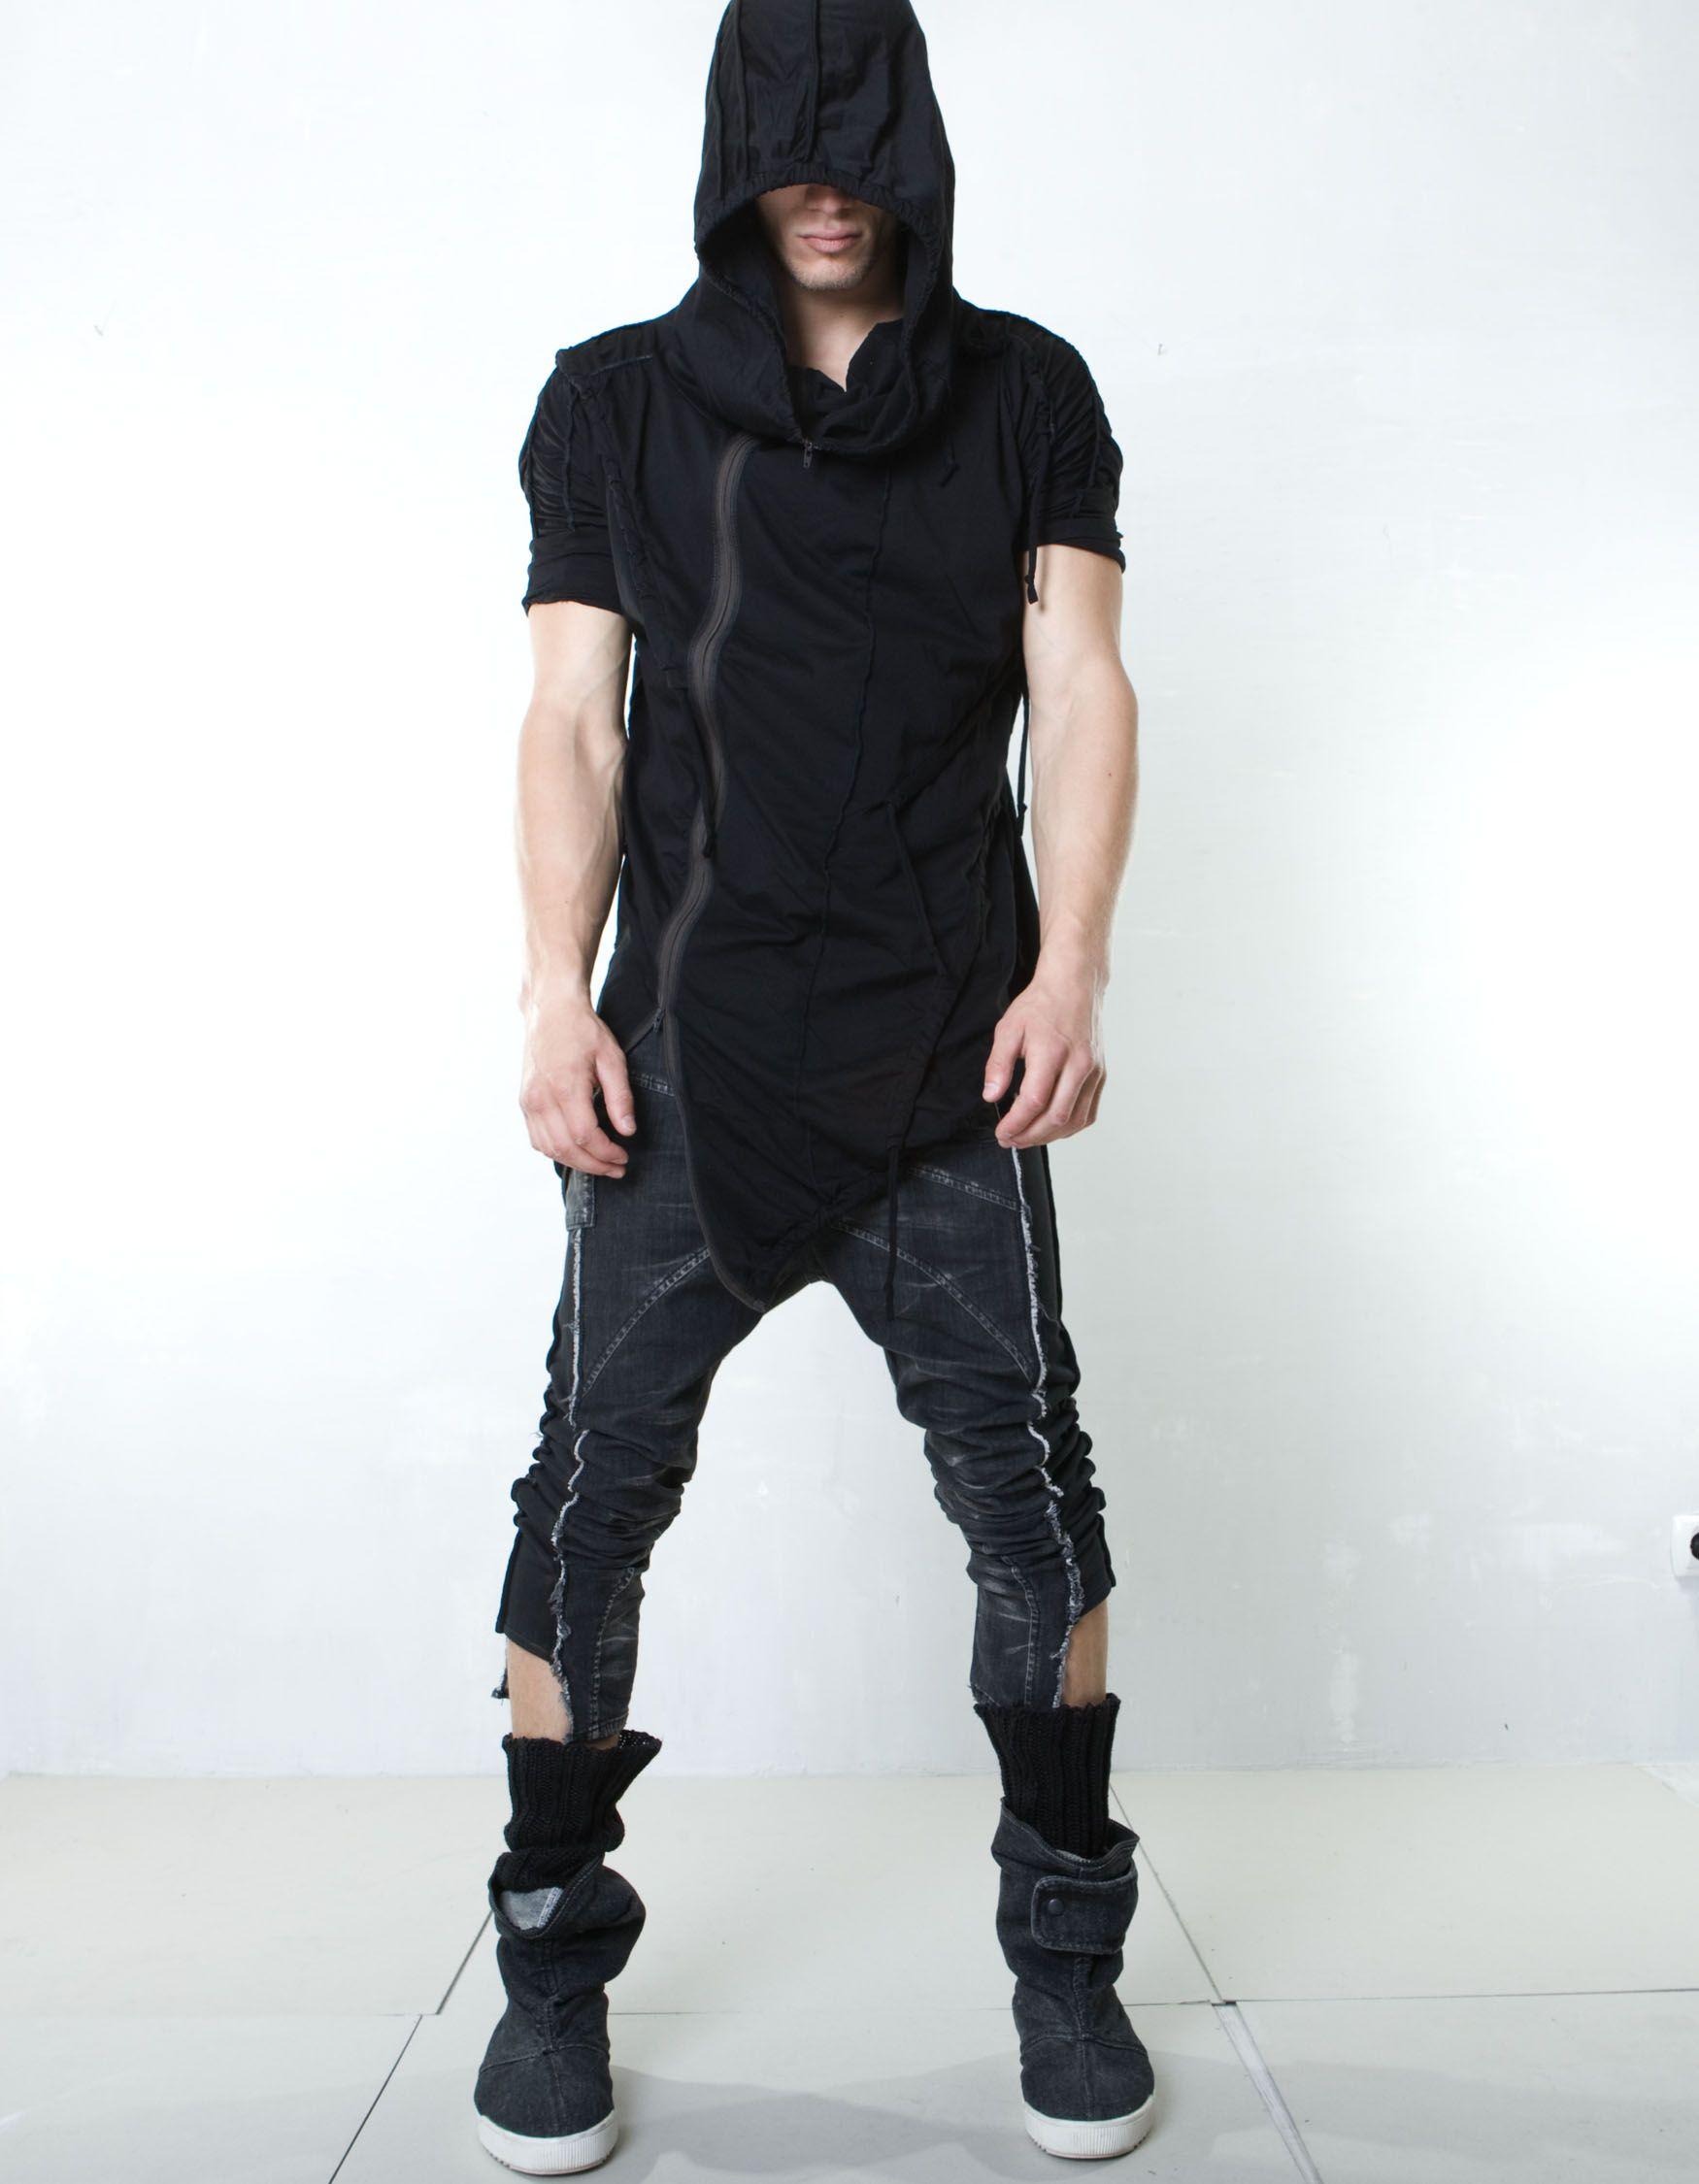 Demobaza - So good. | Random cool stuff | Pinterest | Dystopian fashion Clothes and Man style